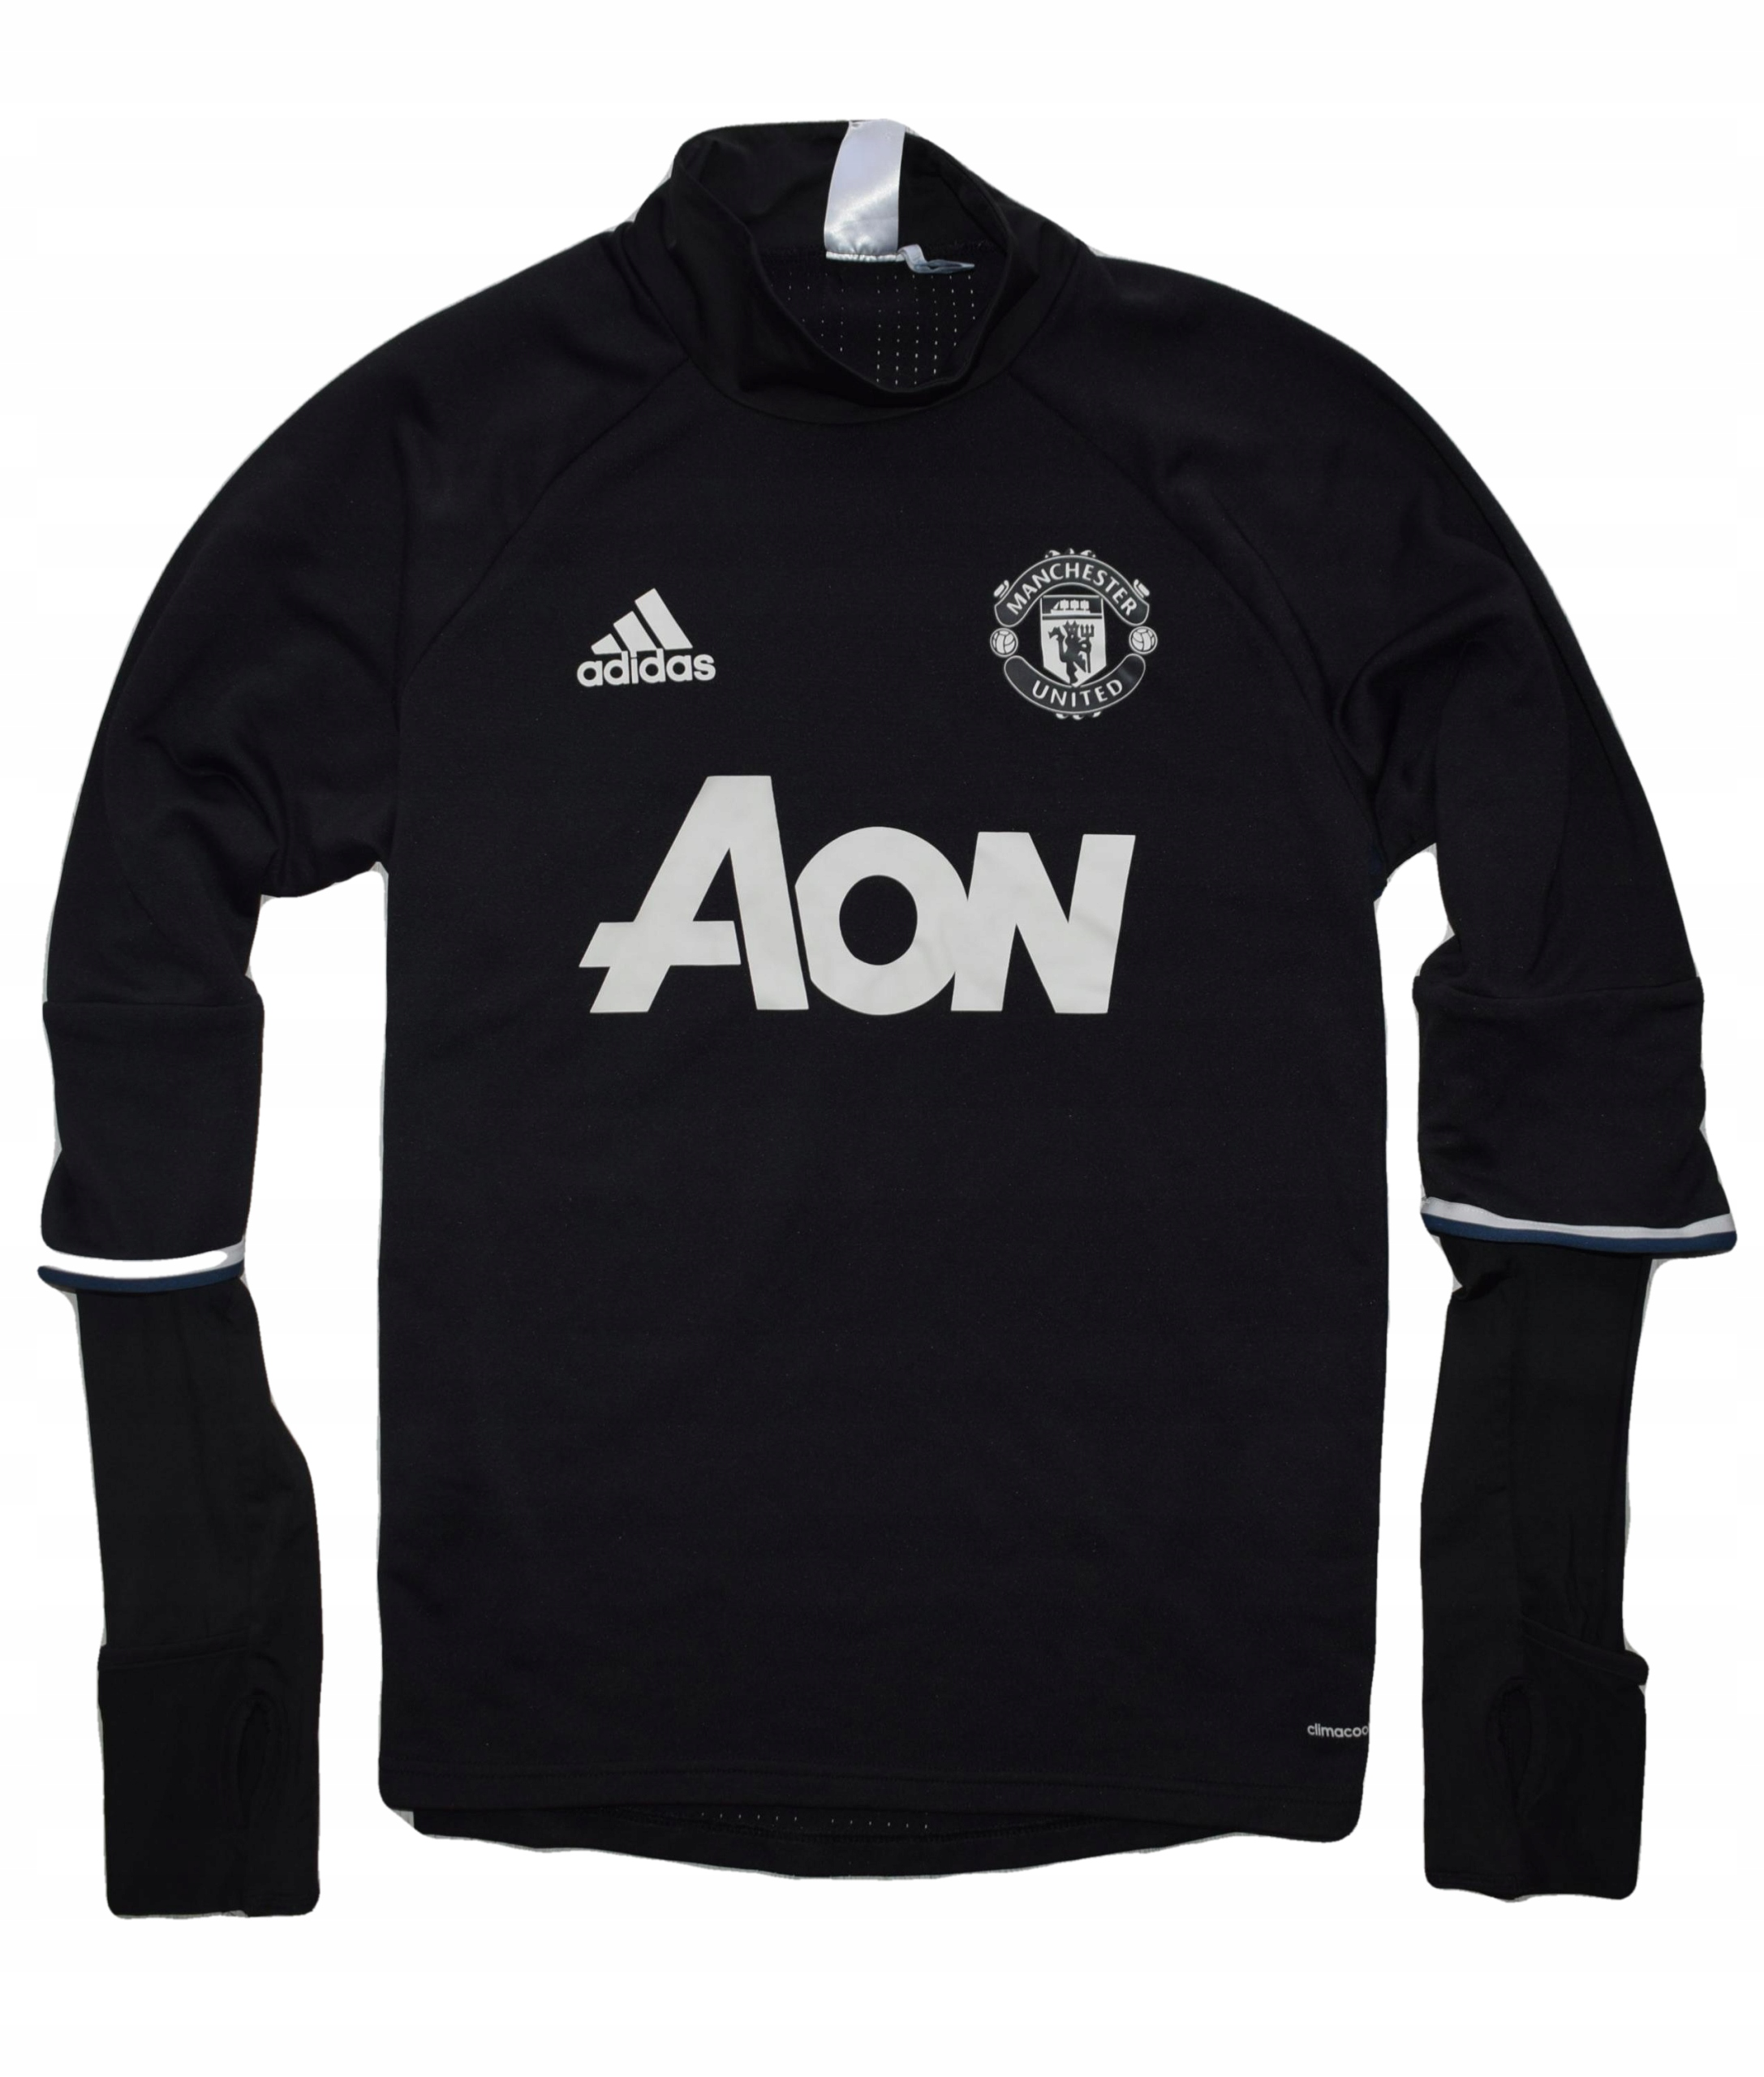 Adidas Manchester UNITED M bluza treningowa